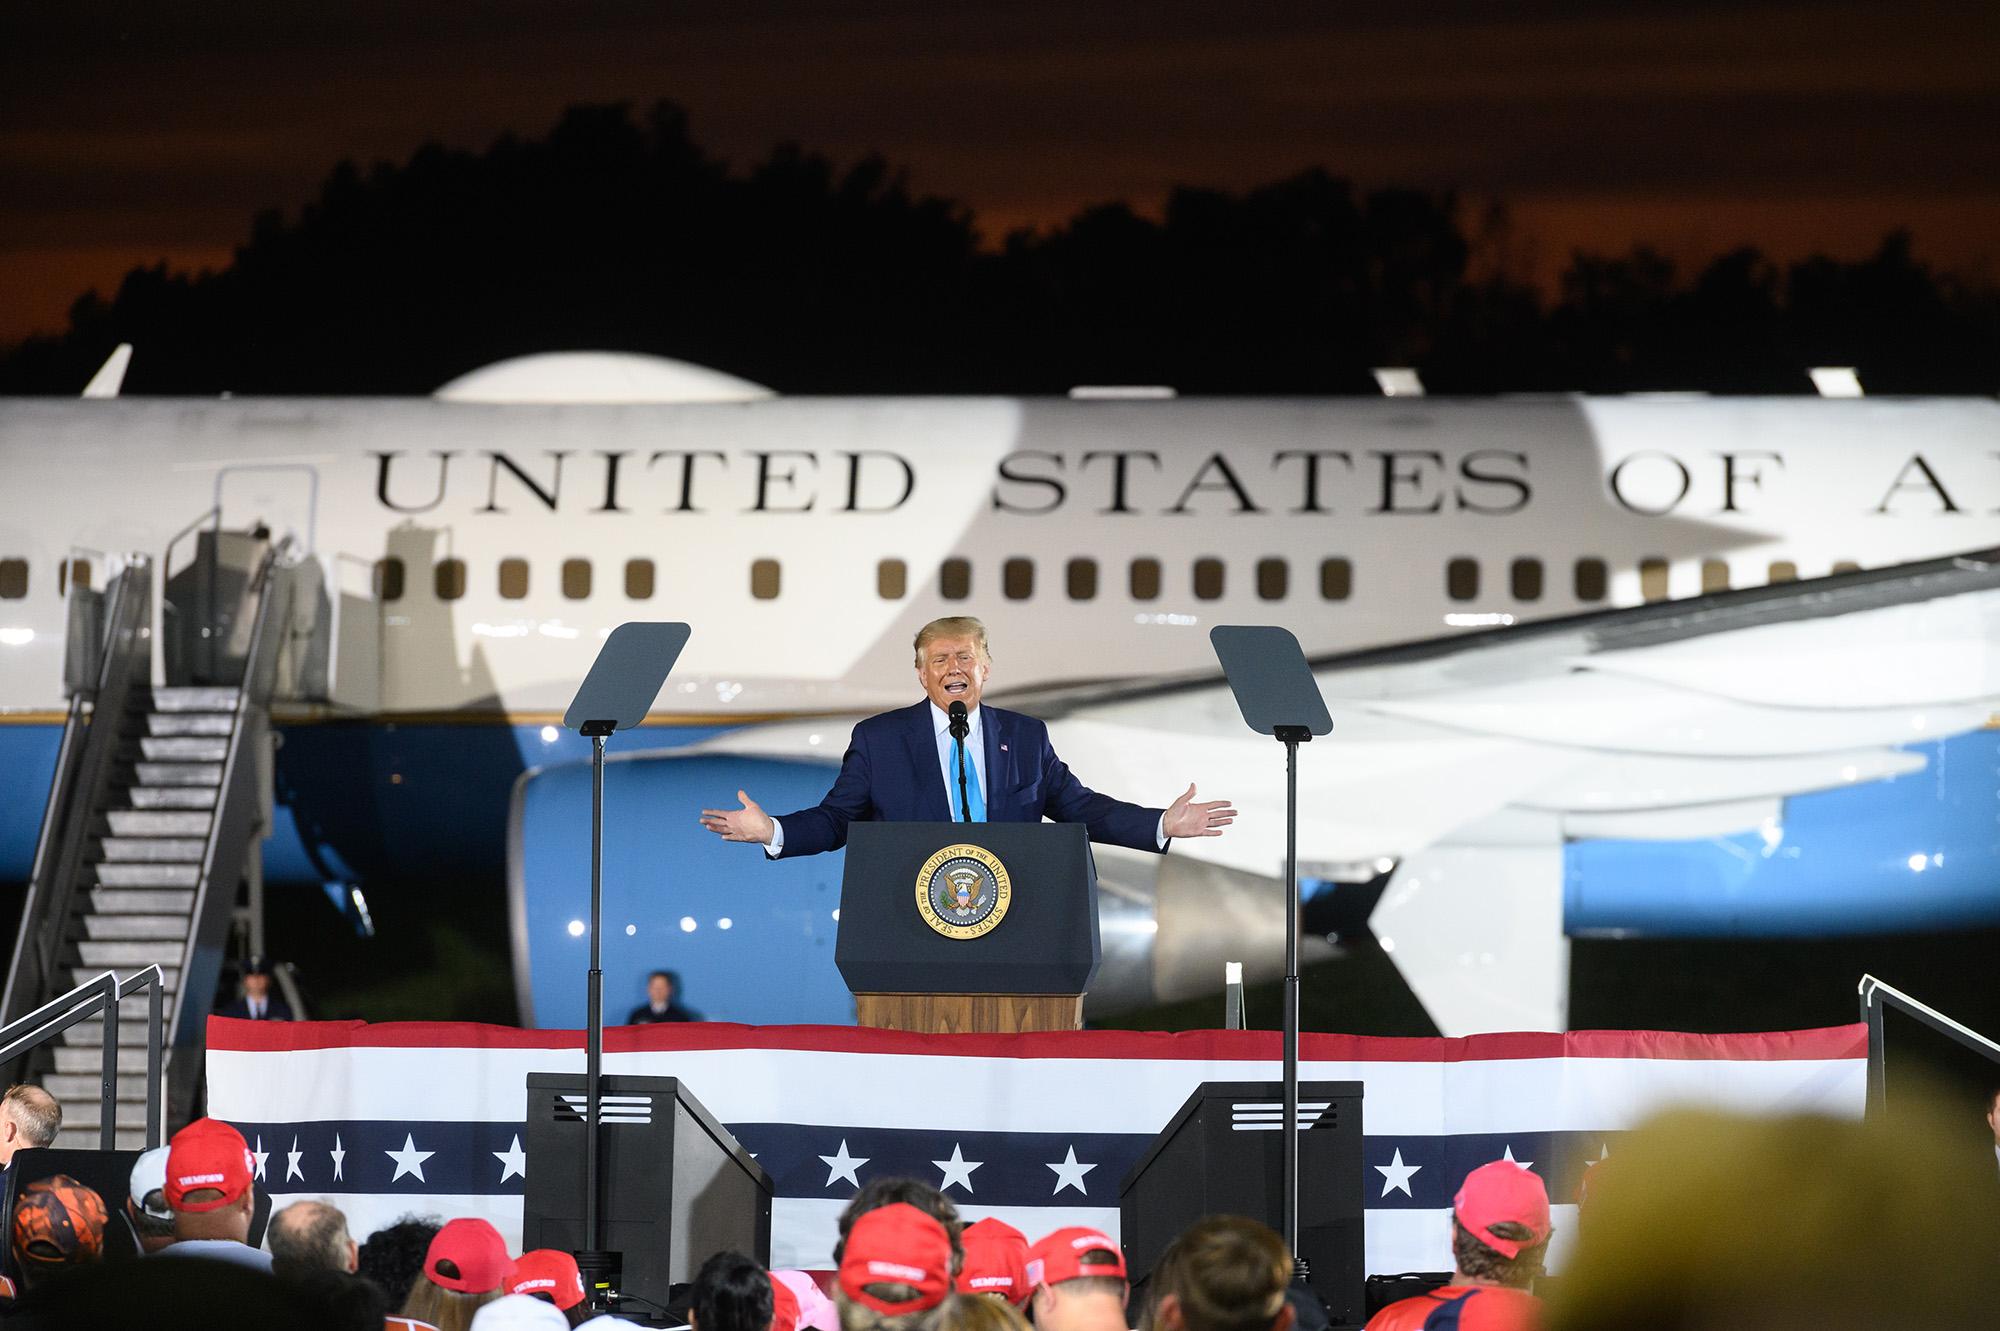 U.S. President Donald Trump speaks during a campaign rally in Latrobe, Pennsylvania, on Thursday, September 3.